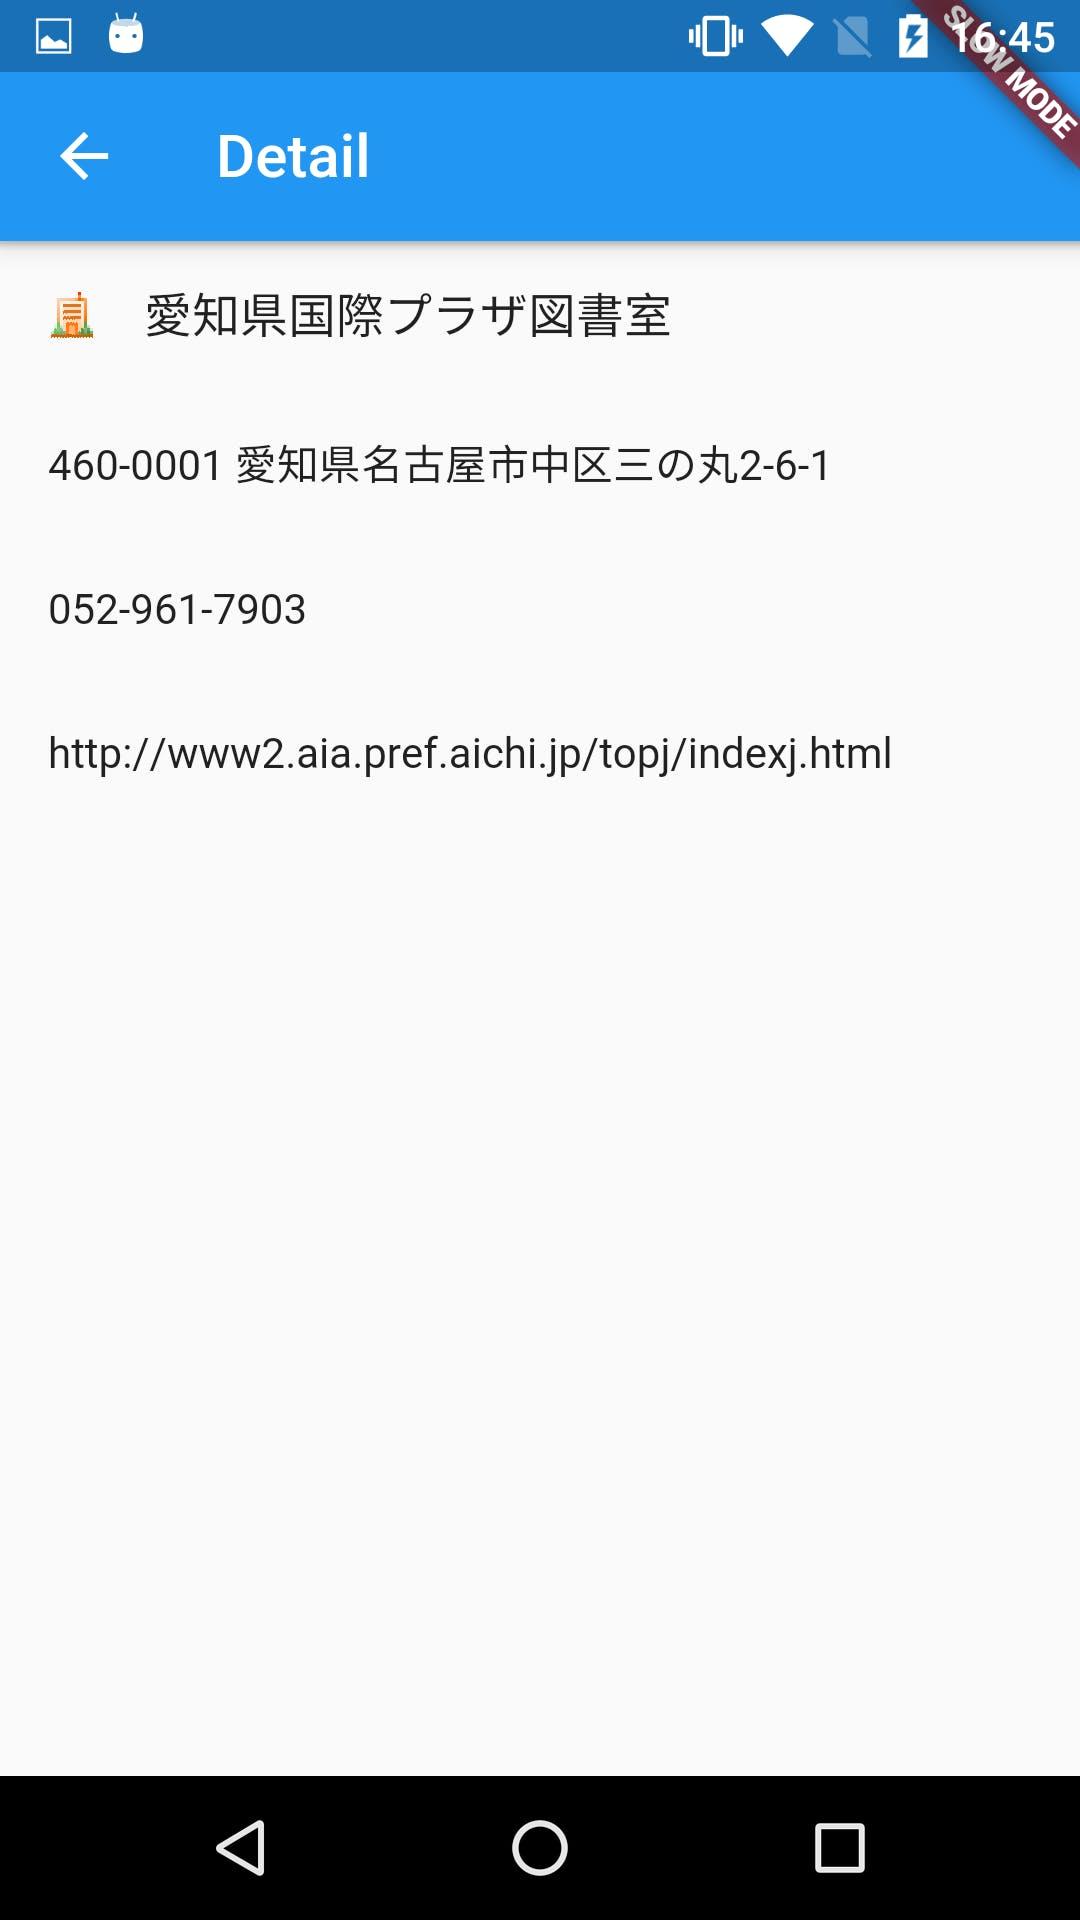 Screenshot_20170402-164556.png